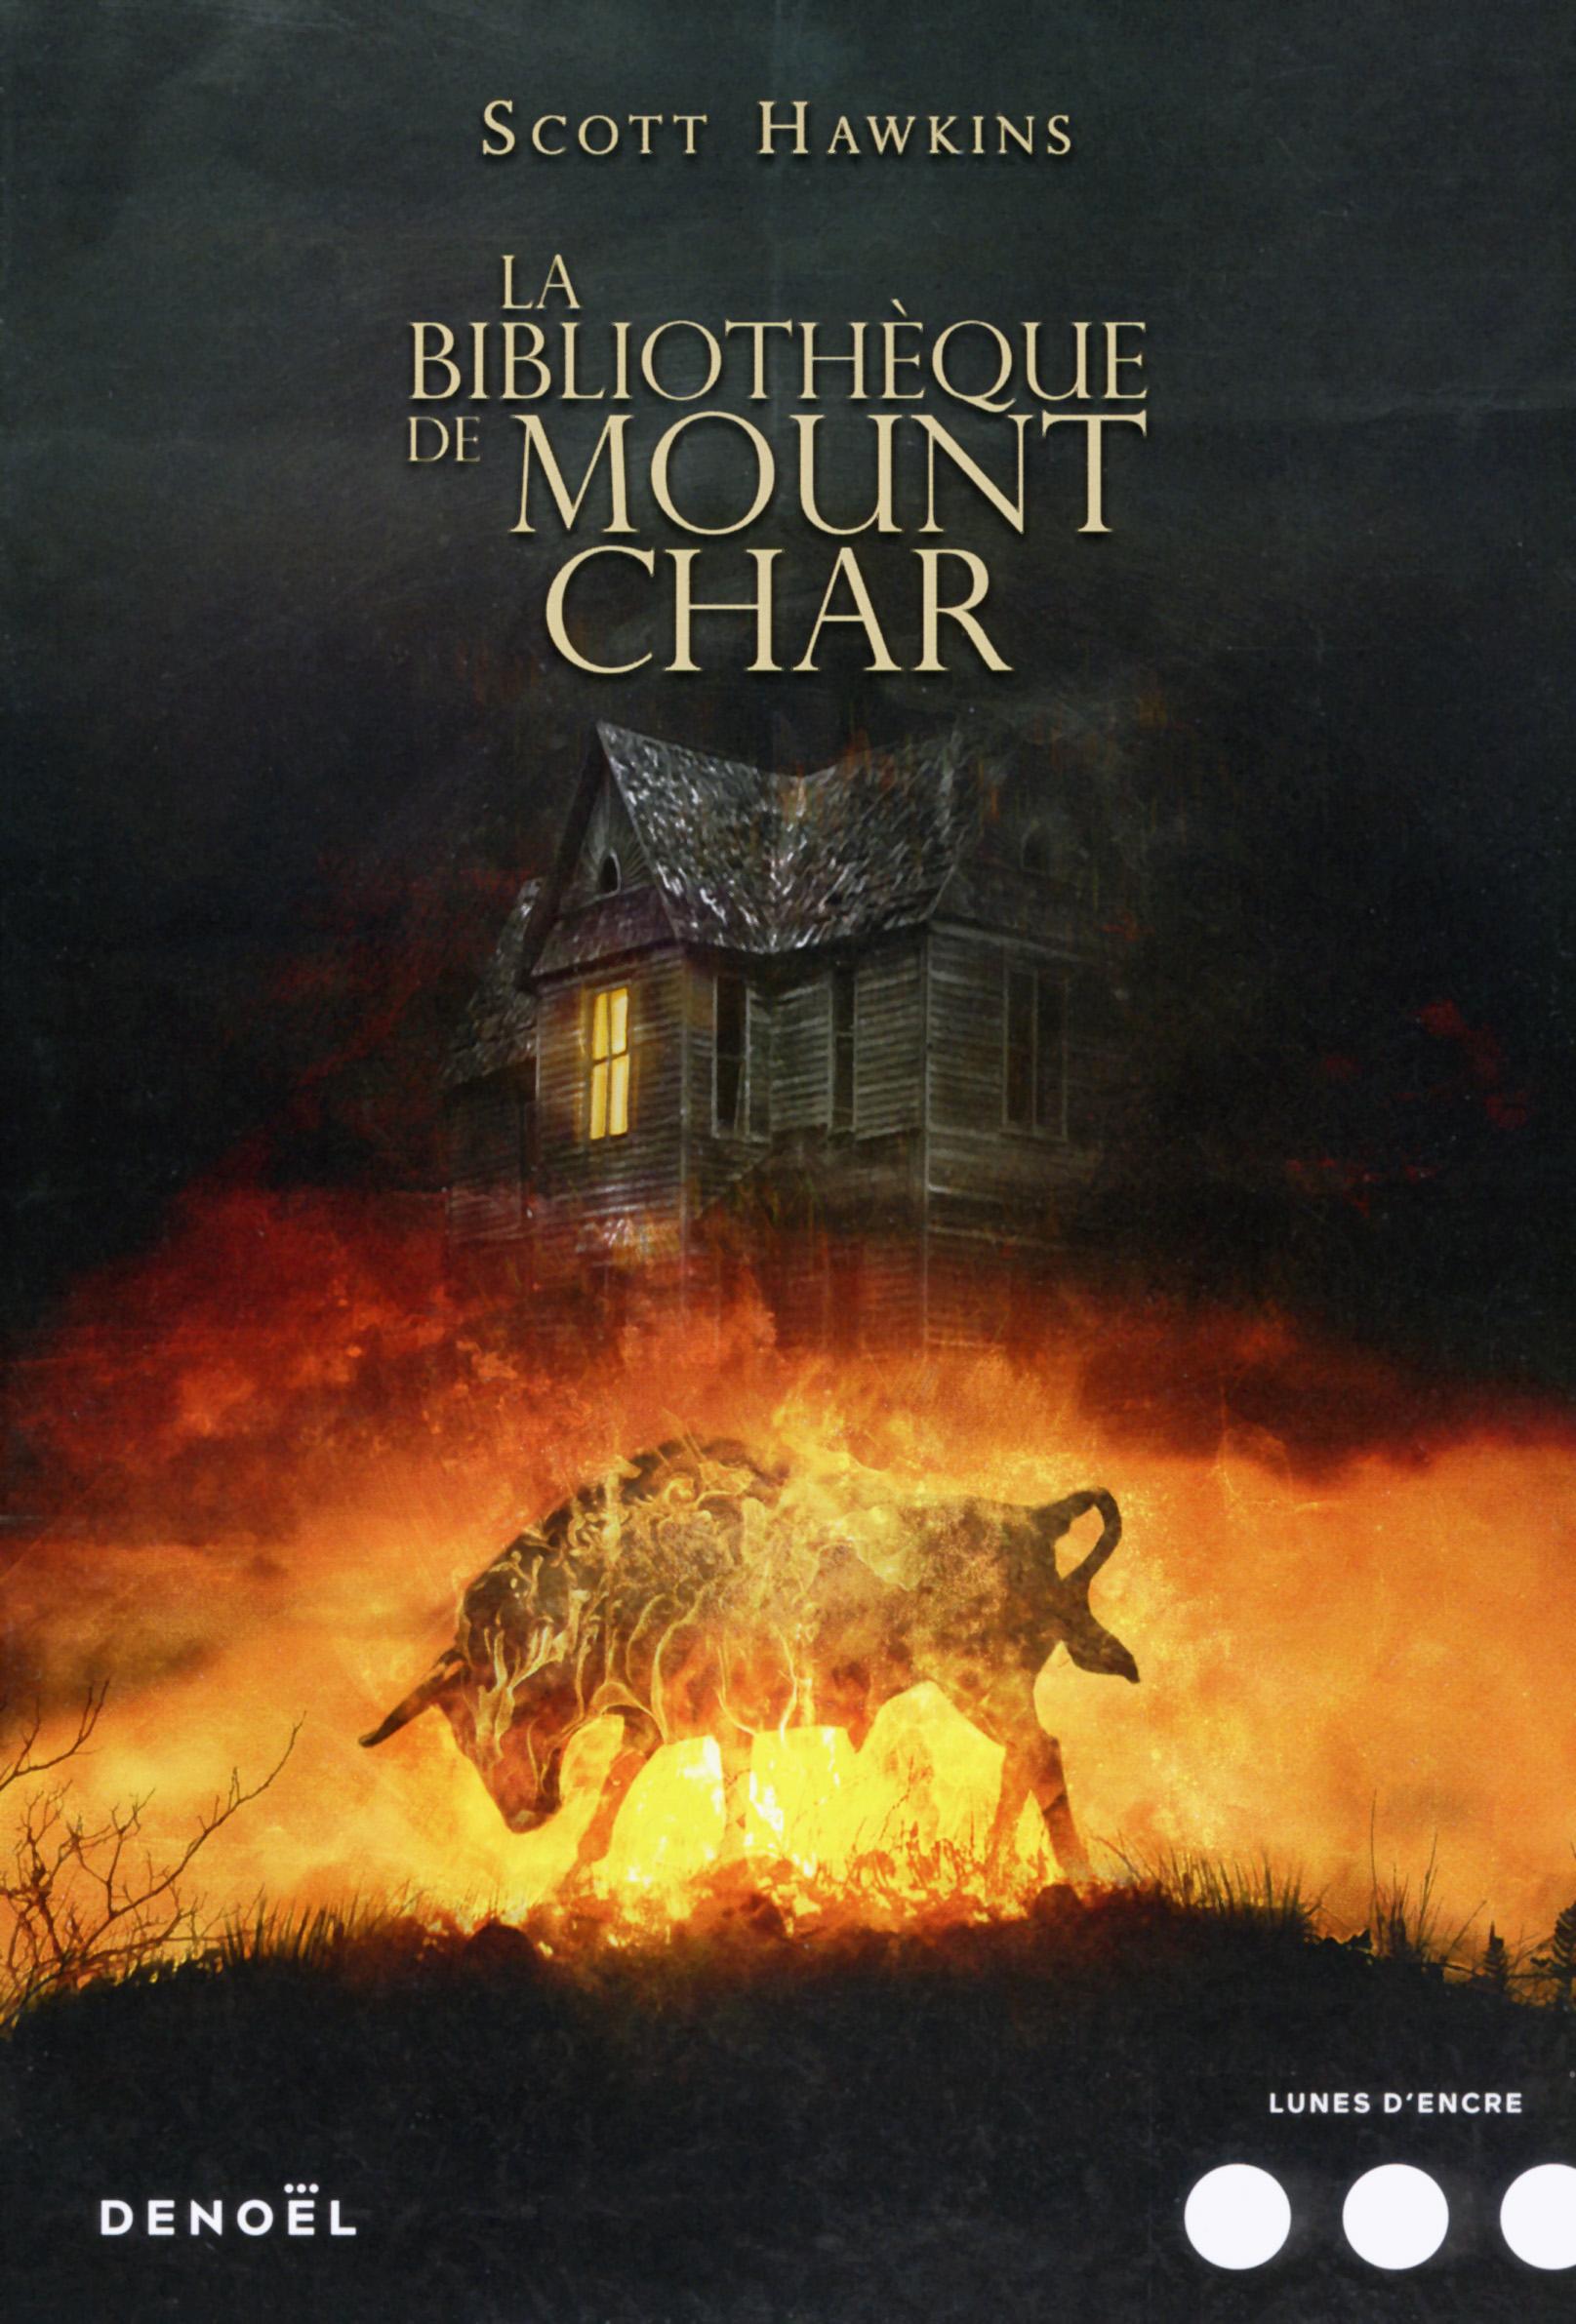 La Bibliothèque de Mount Char de Scott Hawkins